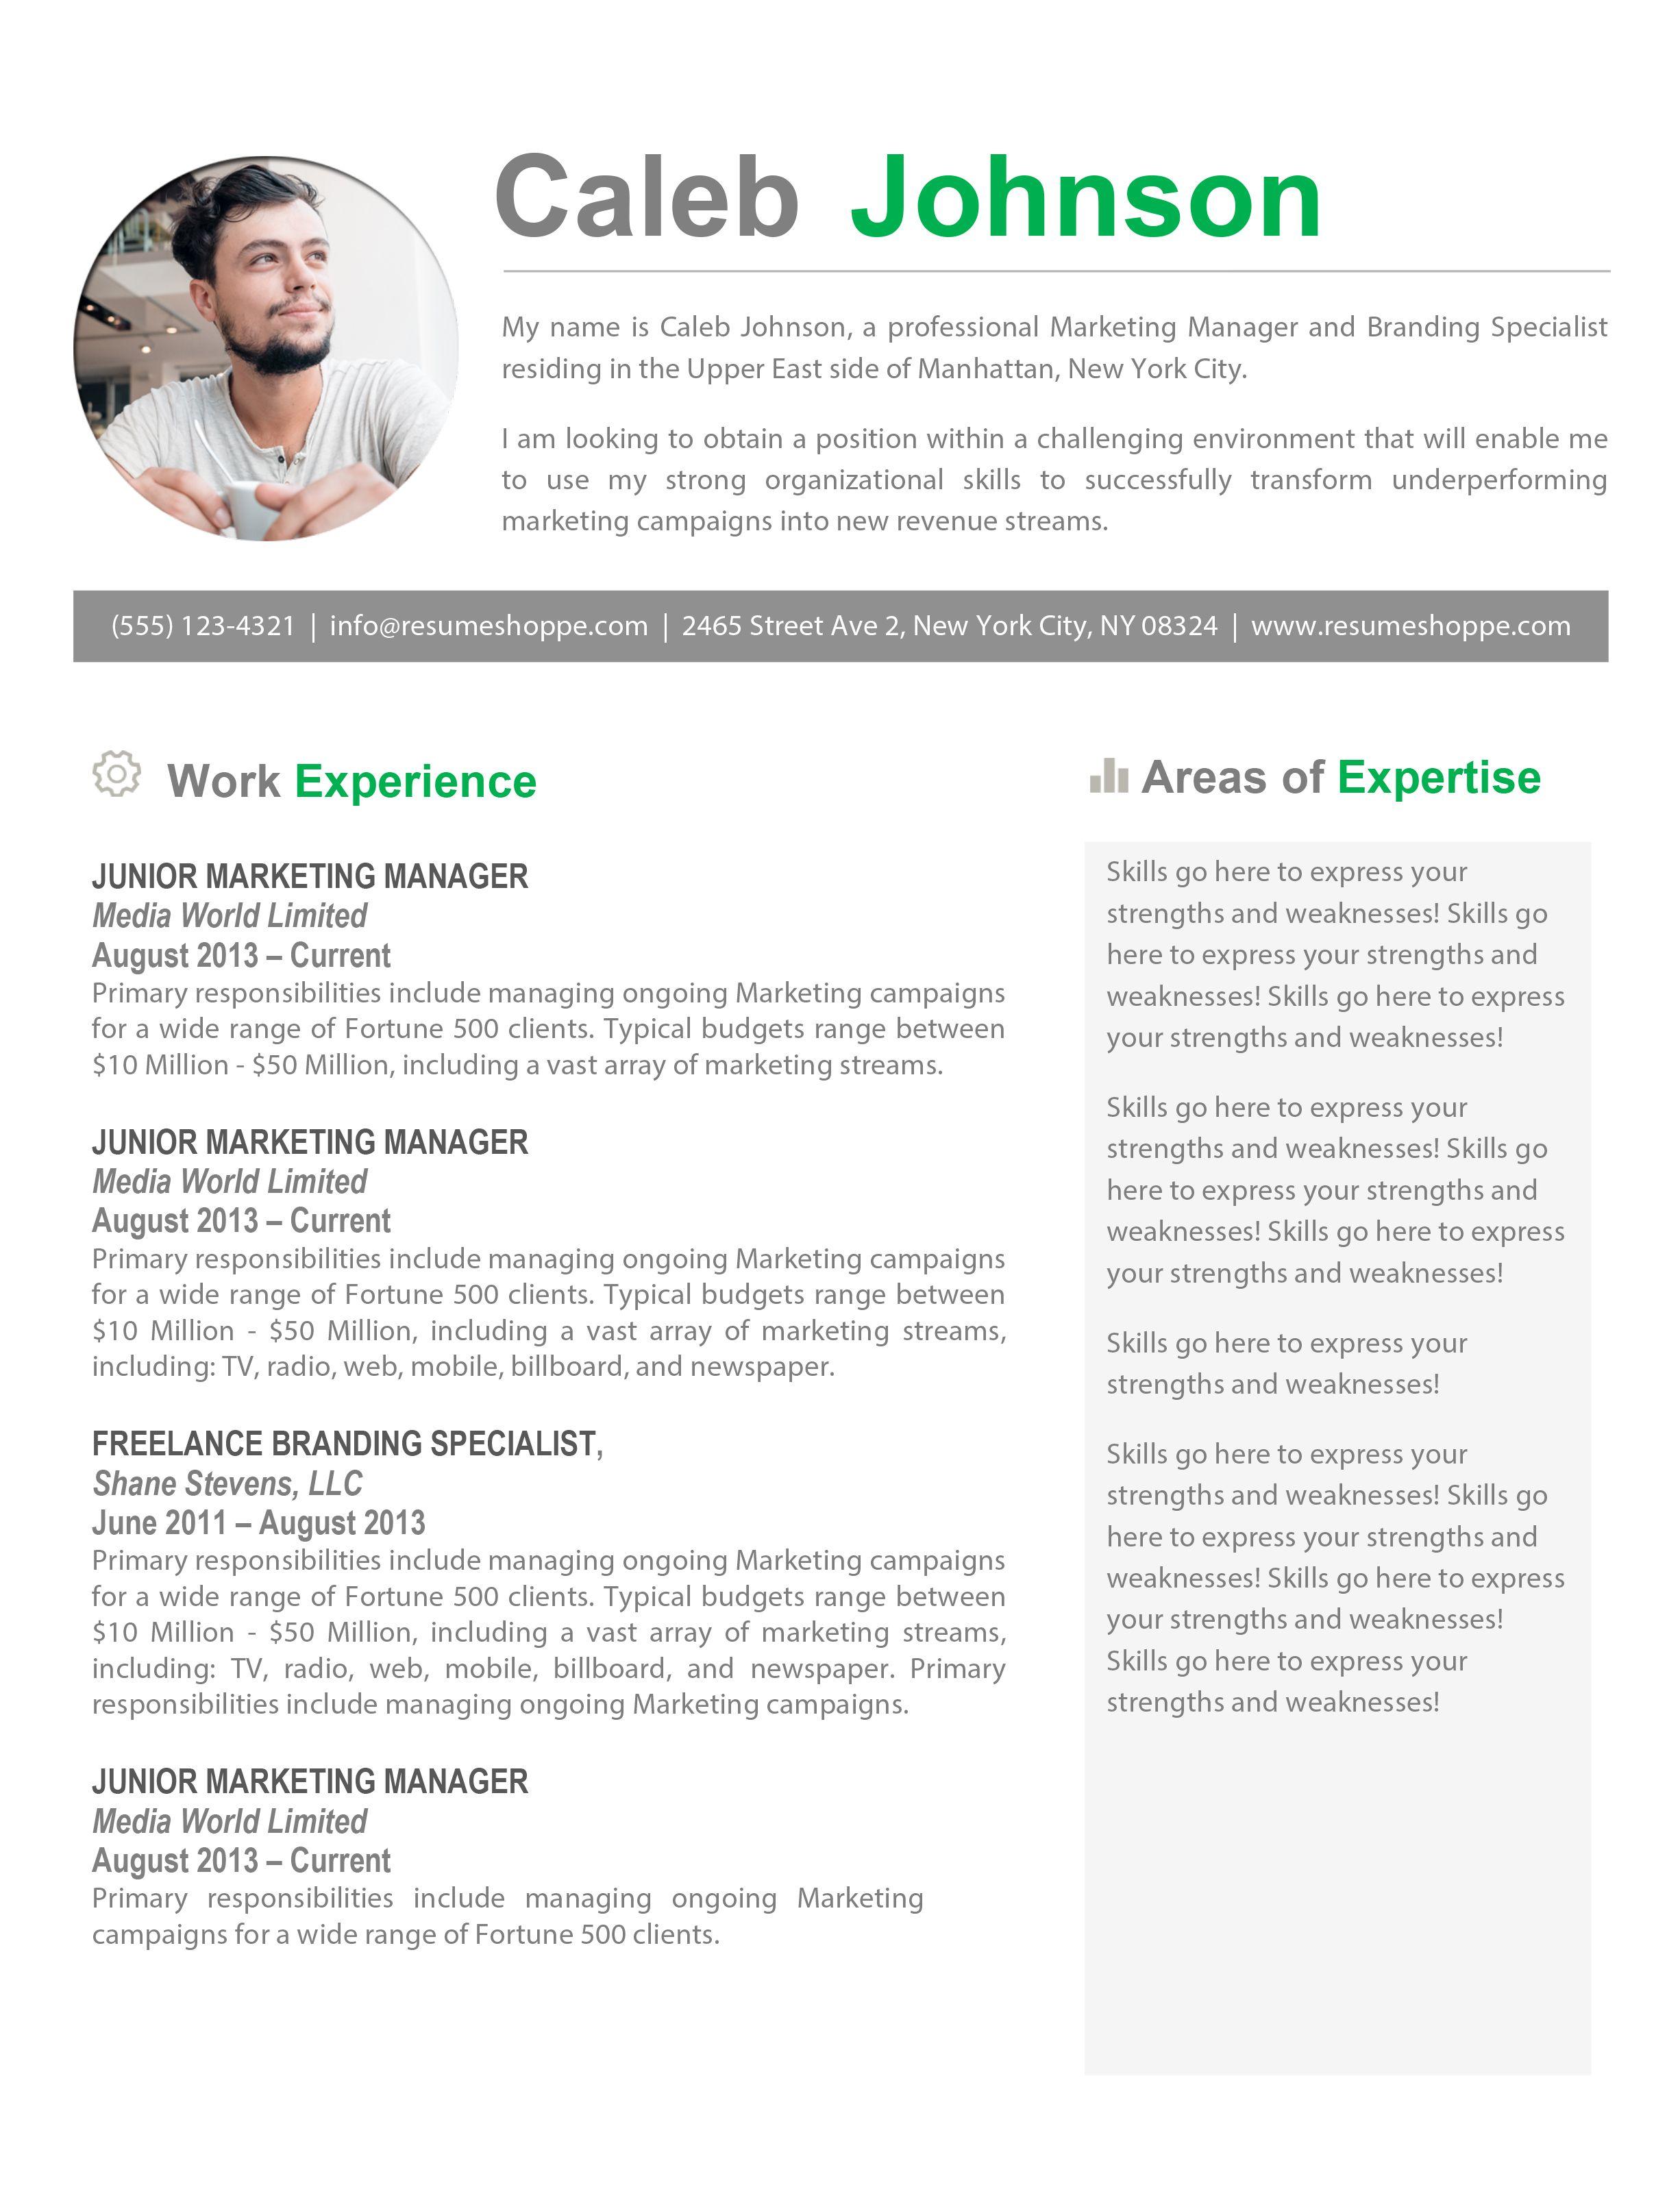 cv template mac cv template pinterest resume templates resume